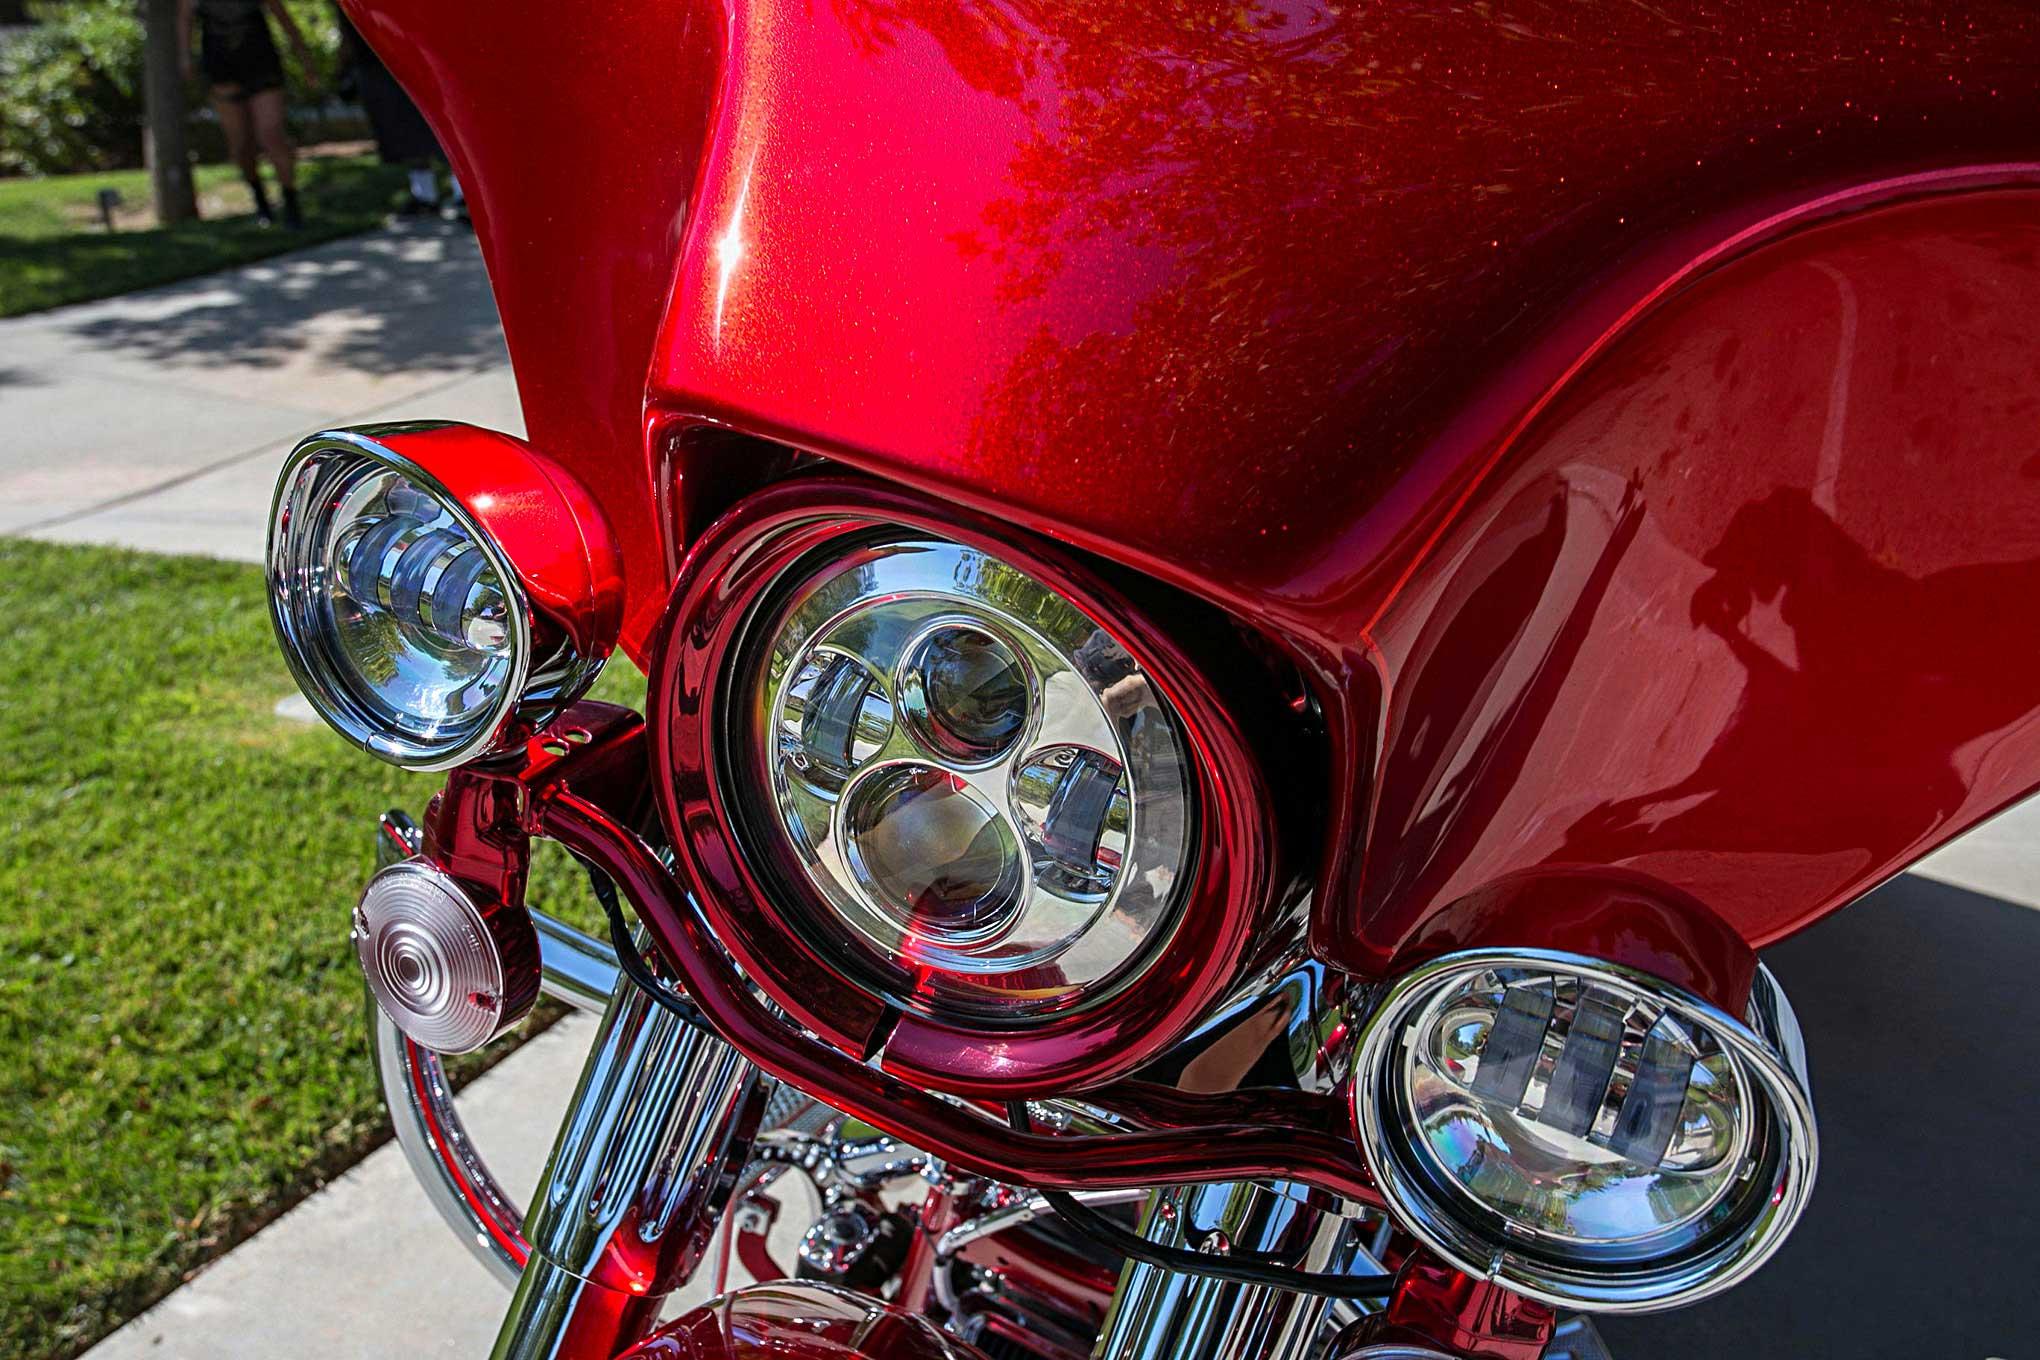 15 Inch Tires >> Serafin Romero's 2005 Harley-Davidson Road King